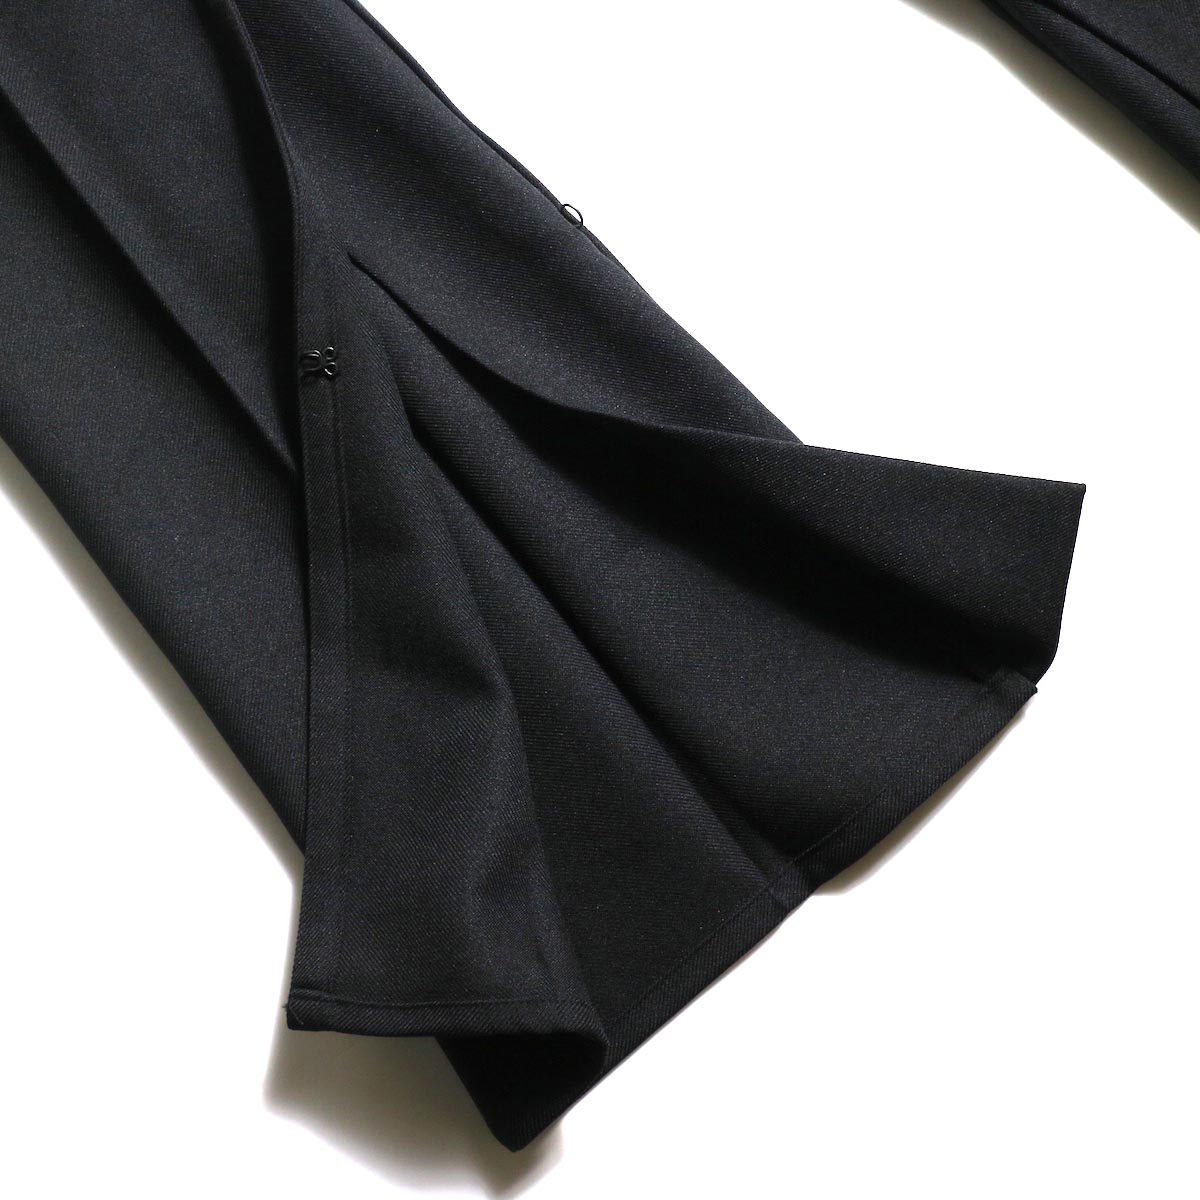 PRE_ / ZK OPEN PANTS (Black)フレア